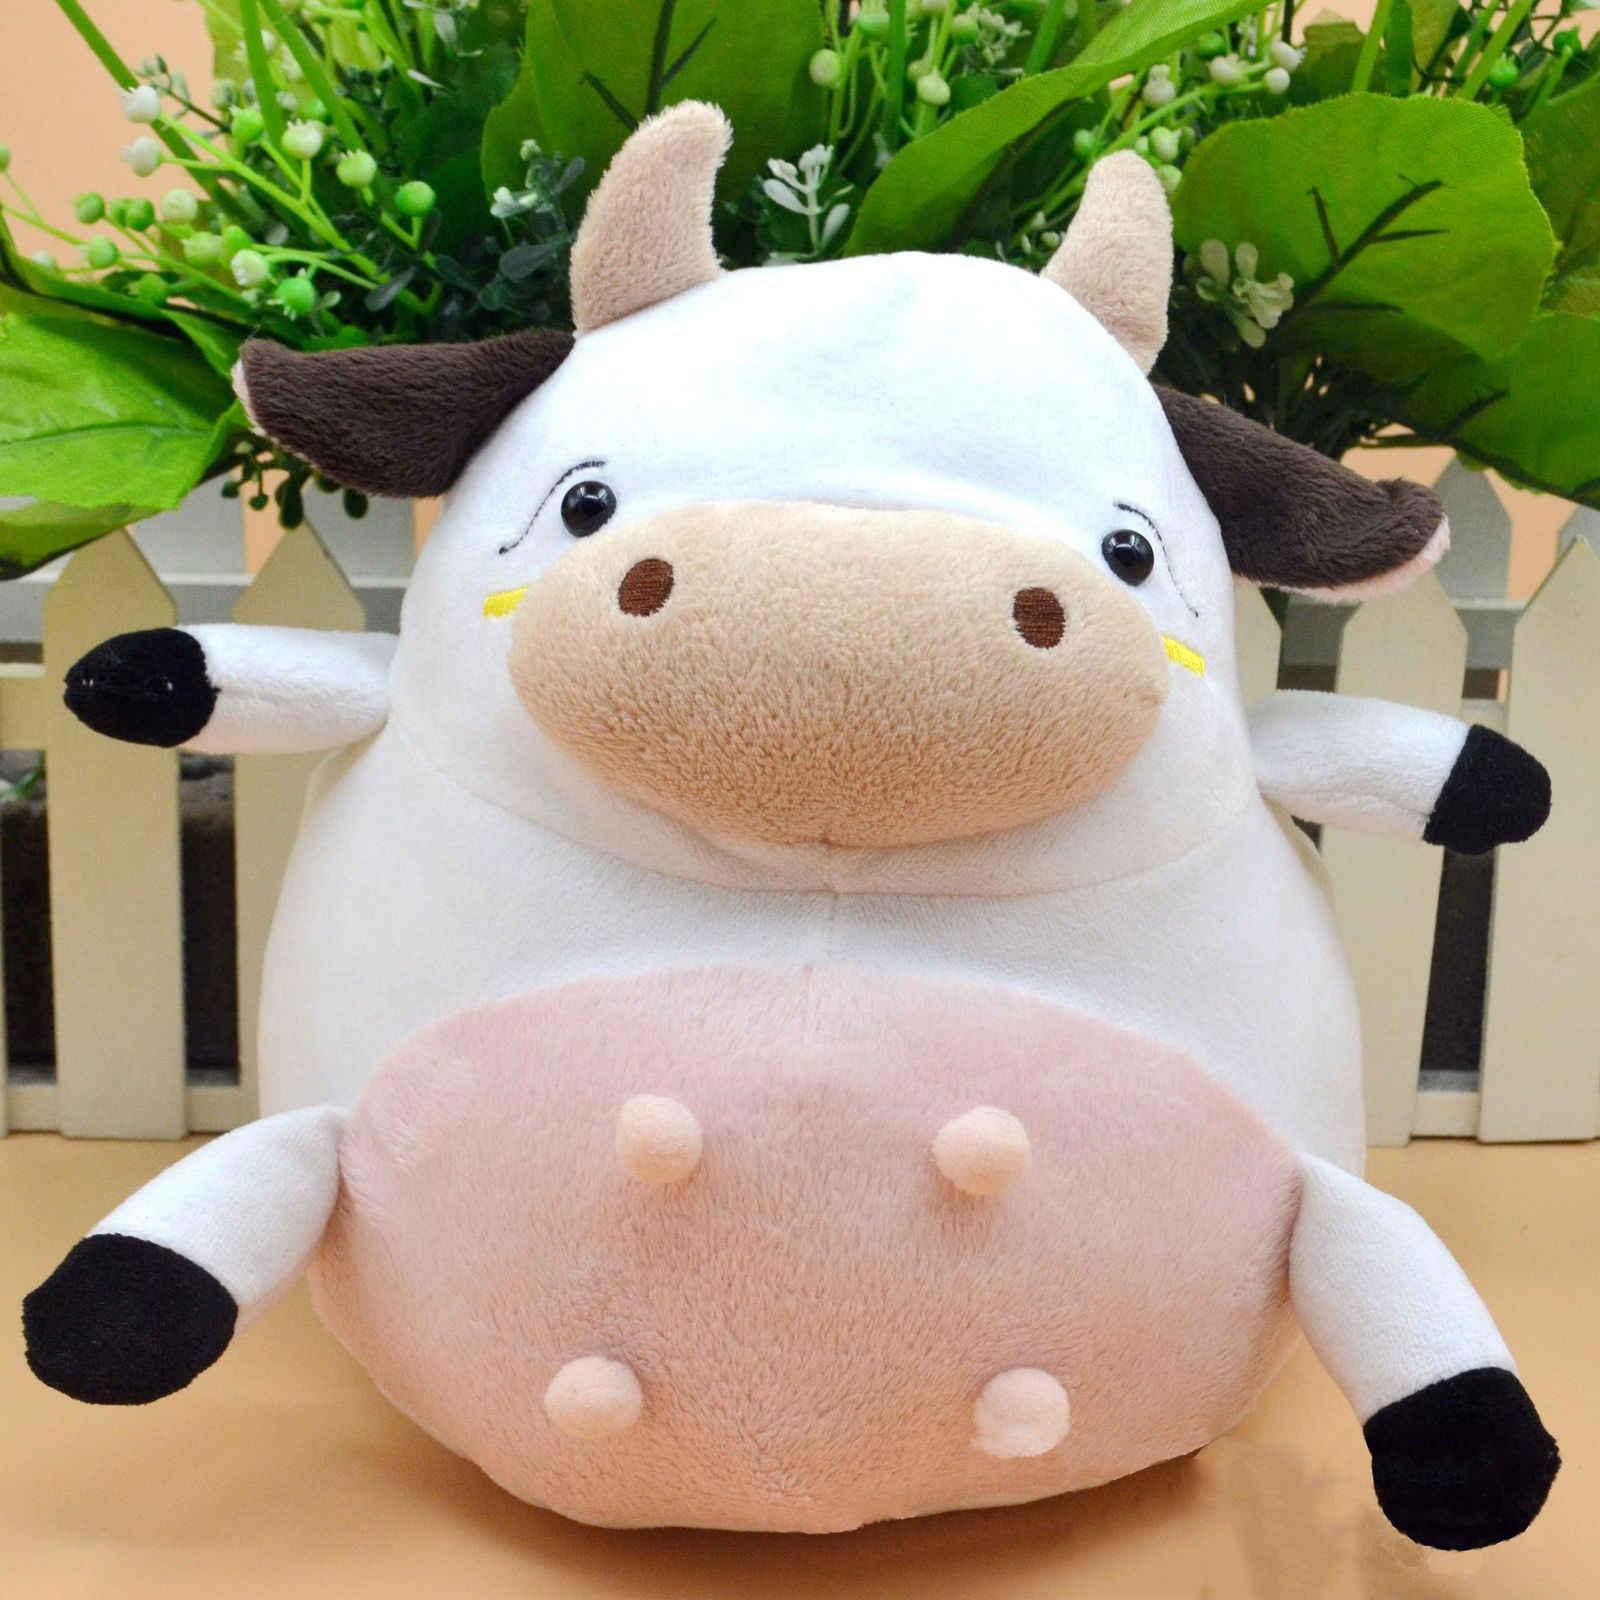 099aac3ba20bb DDLC Doki Doki Literature Club Mr Cow Plush Toy Sayori Yuri Monika Cosplay